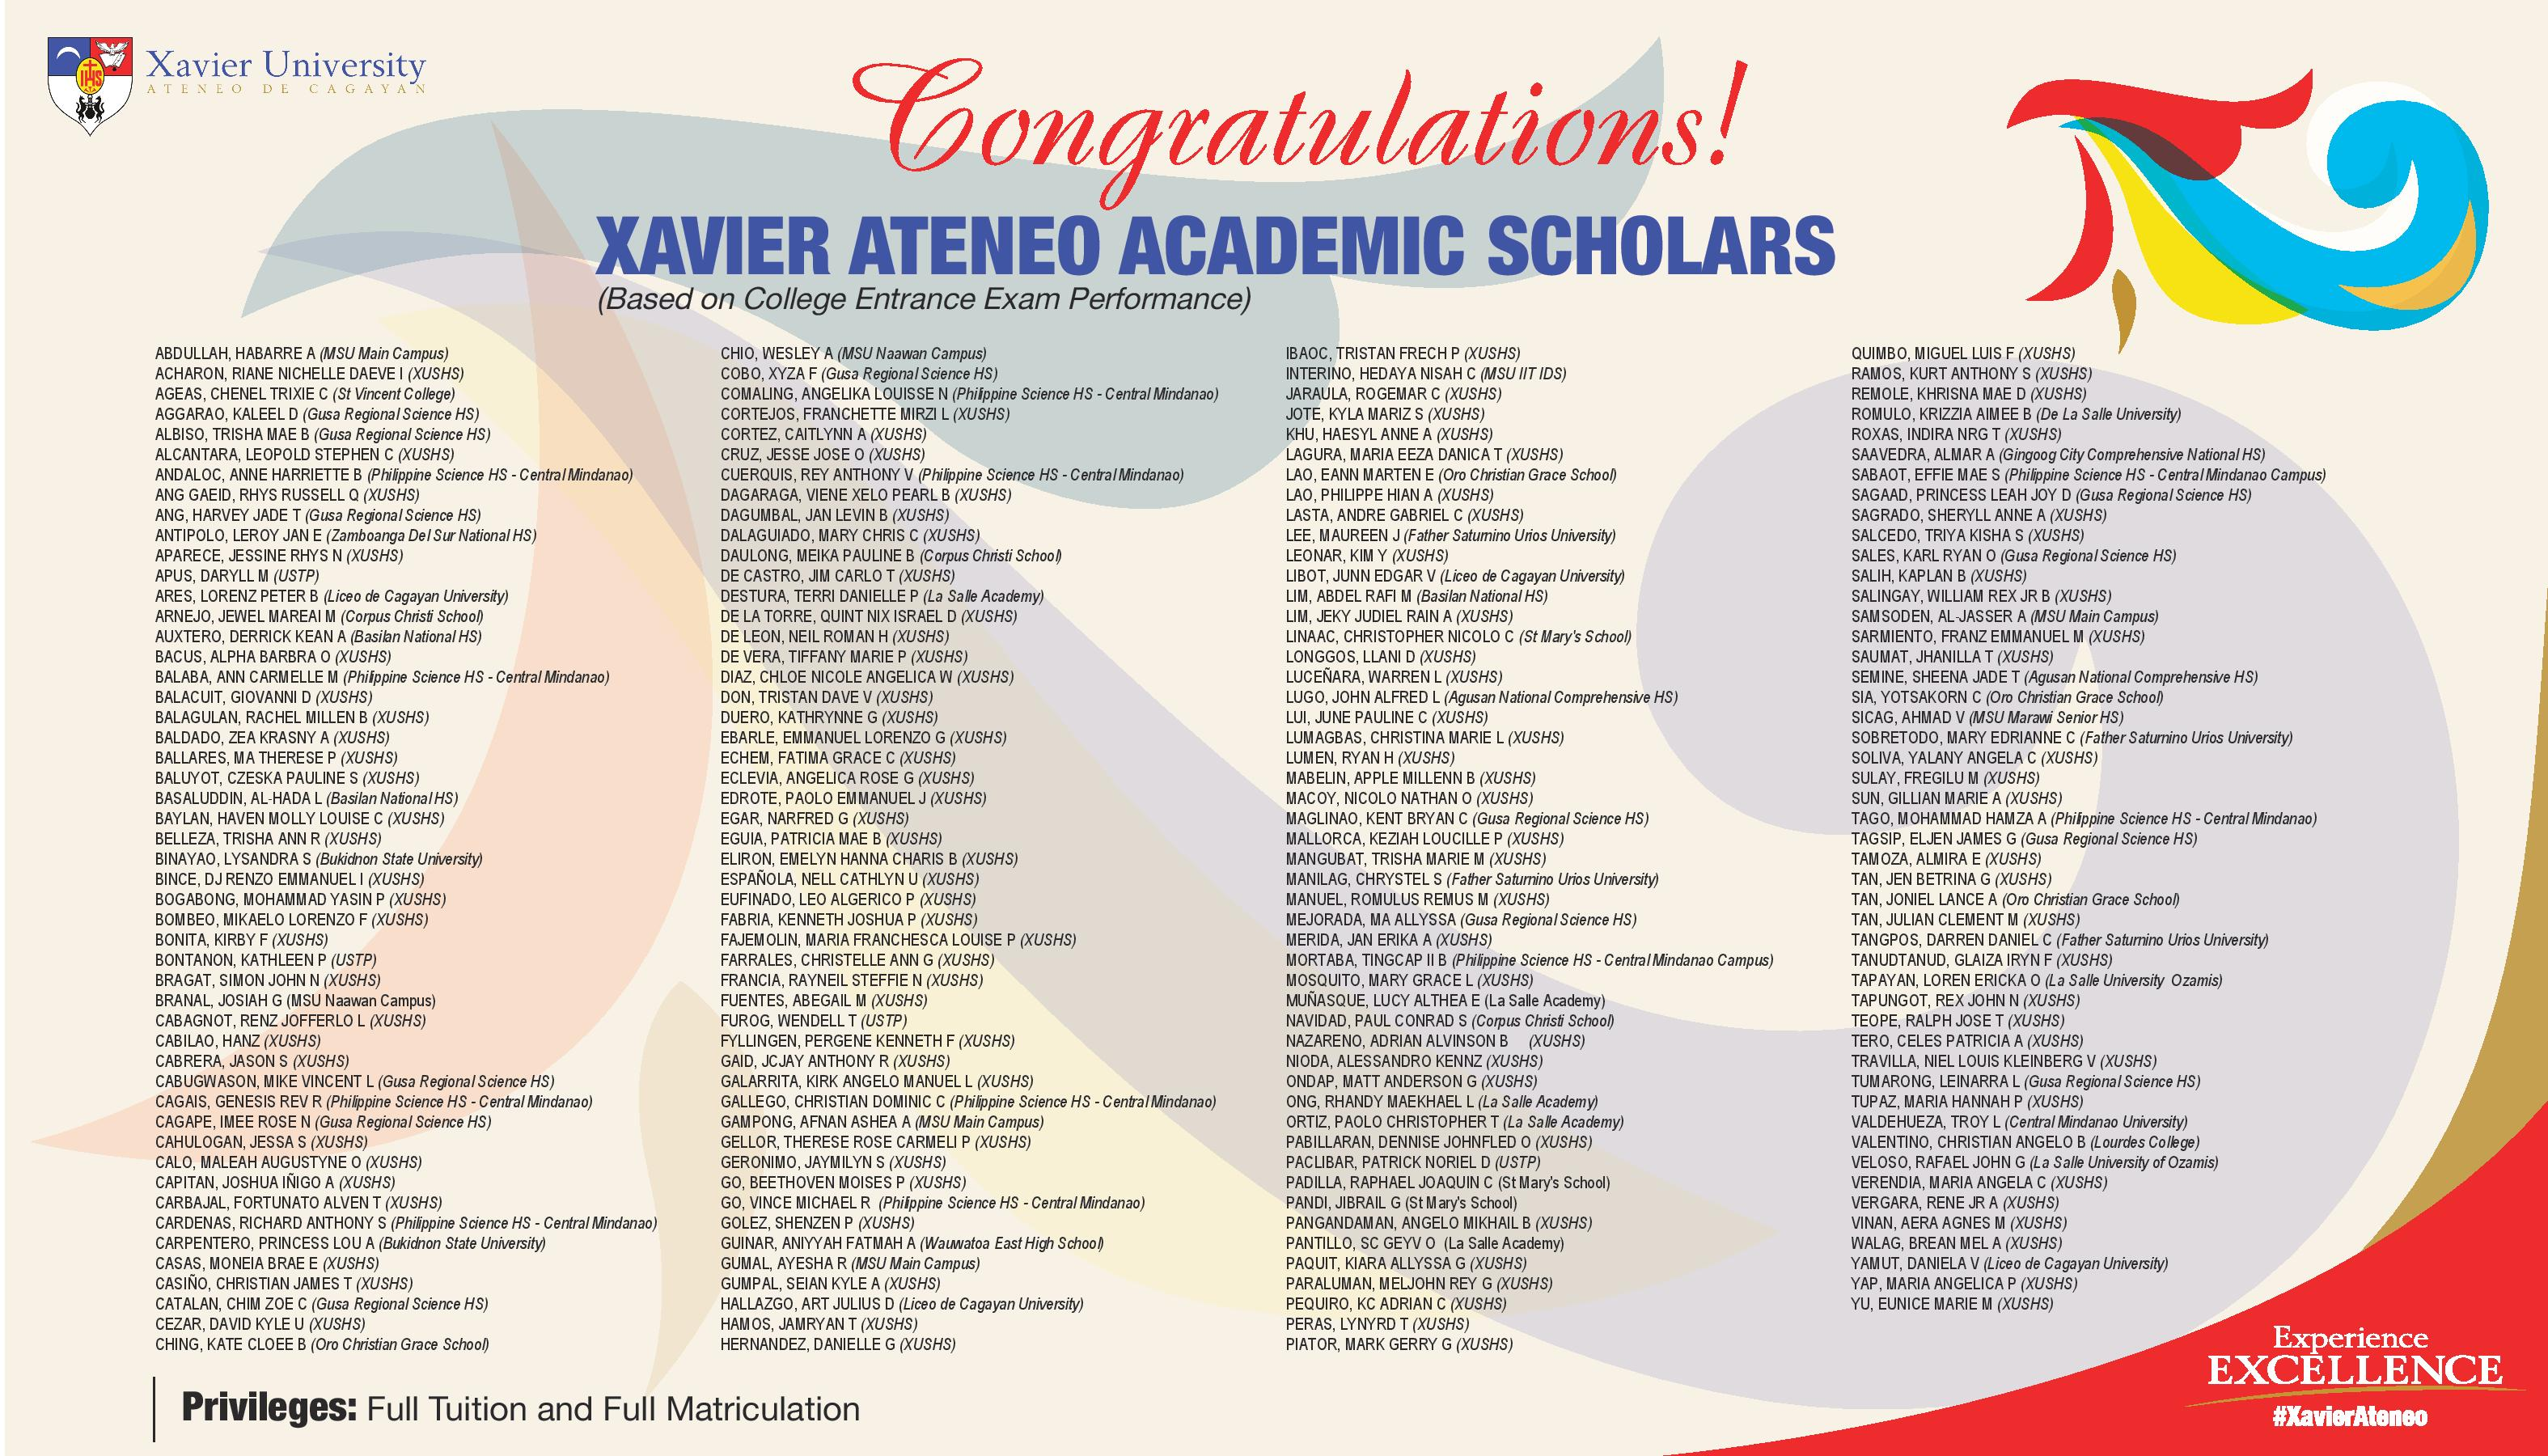 Xavier University - Xavier Ateneo Academic Scholars (AY2018